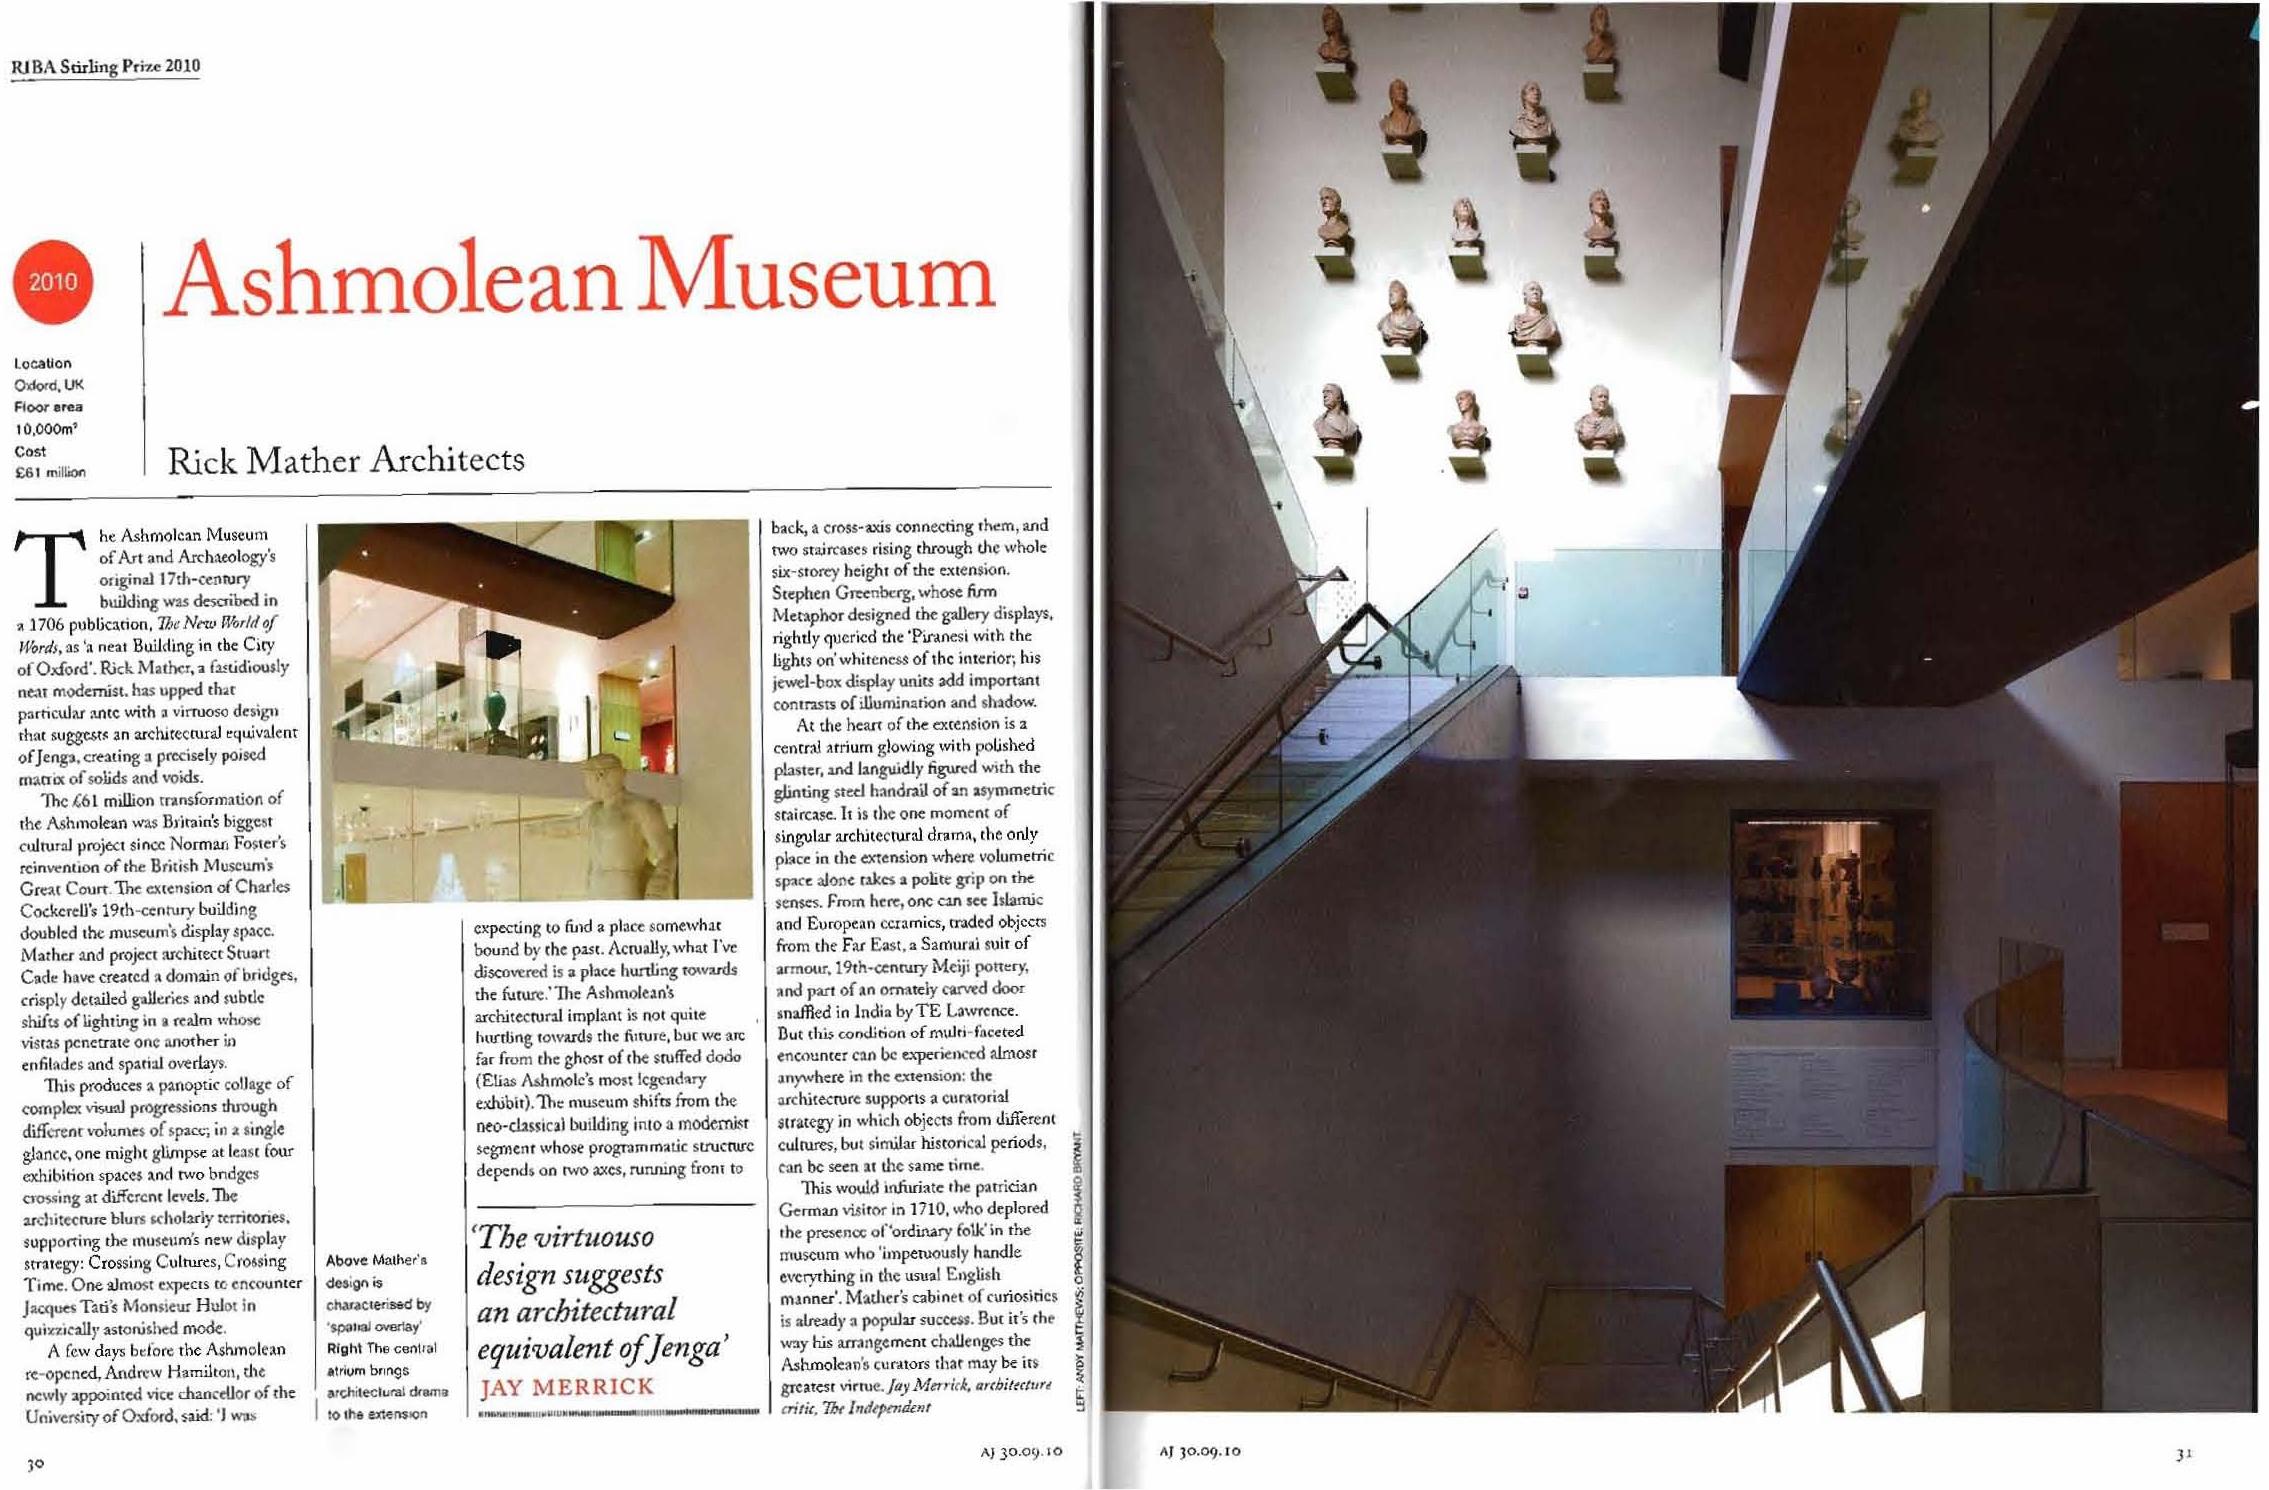 2010_Ashmolean_Museum_Page_1